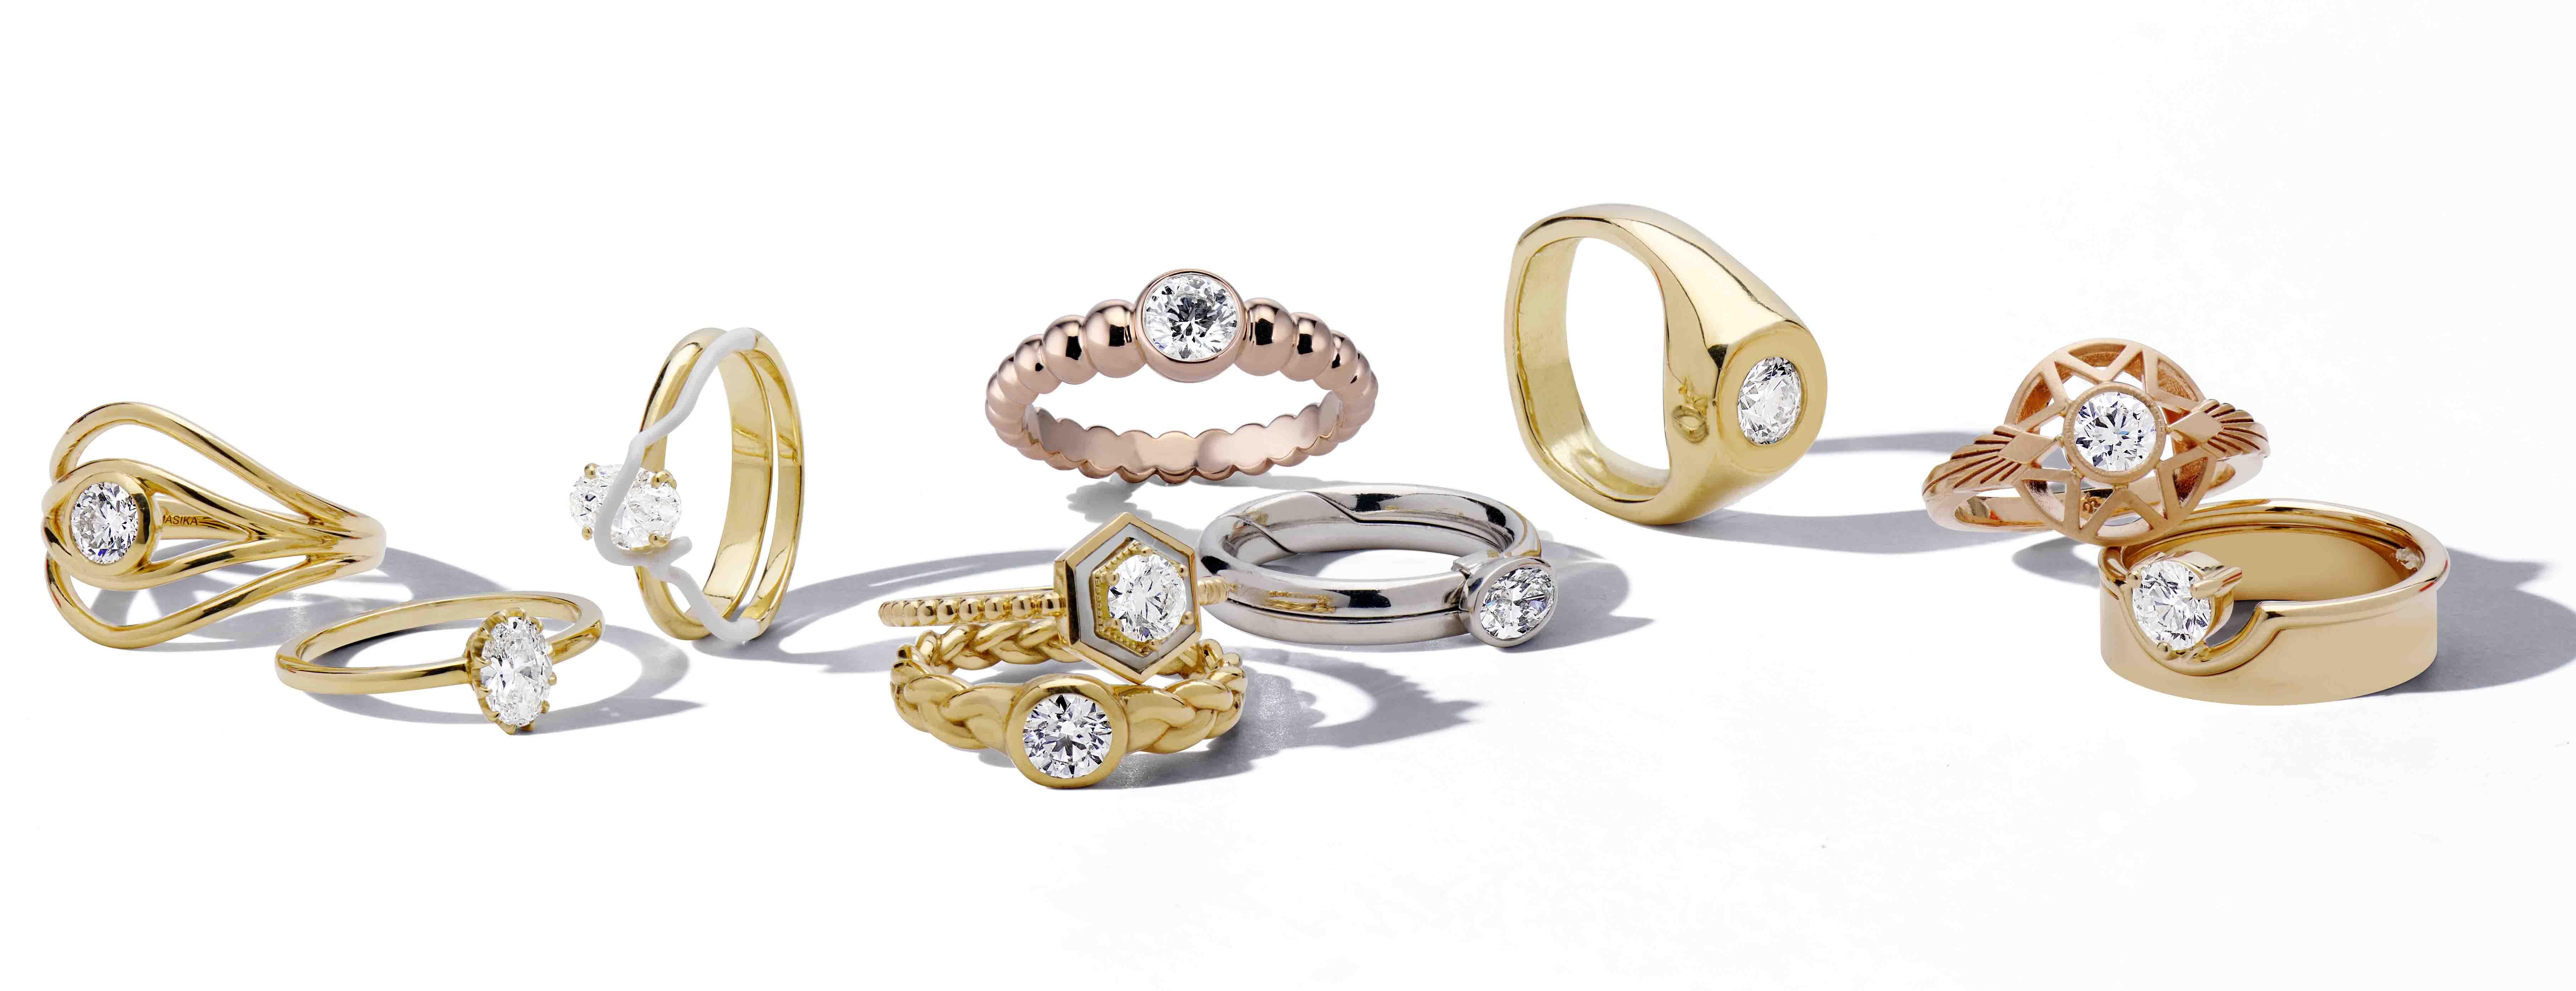 De Beers x Blue Nile Ten Ten engagement ring collaboration